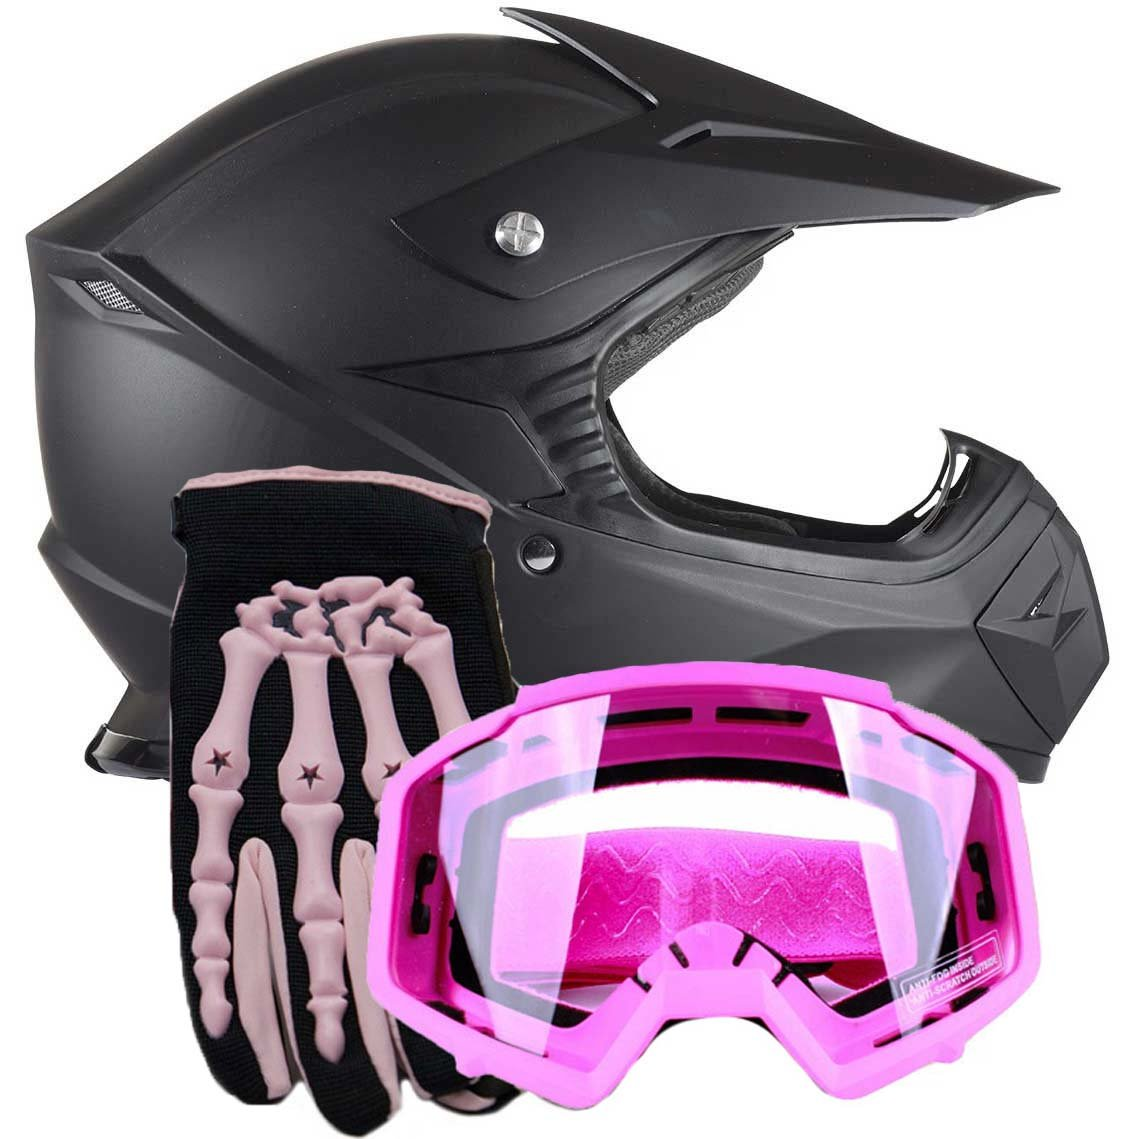 Youth Kids Offroad Helmet Gloves Goggles GEAR COMBO Motocross ATV Dirt Bike Motorcycle Pink Matte Black M Medium